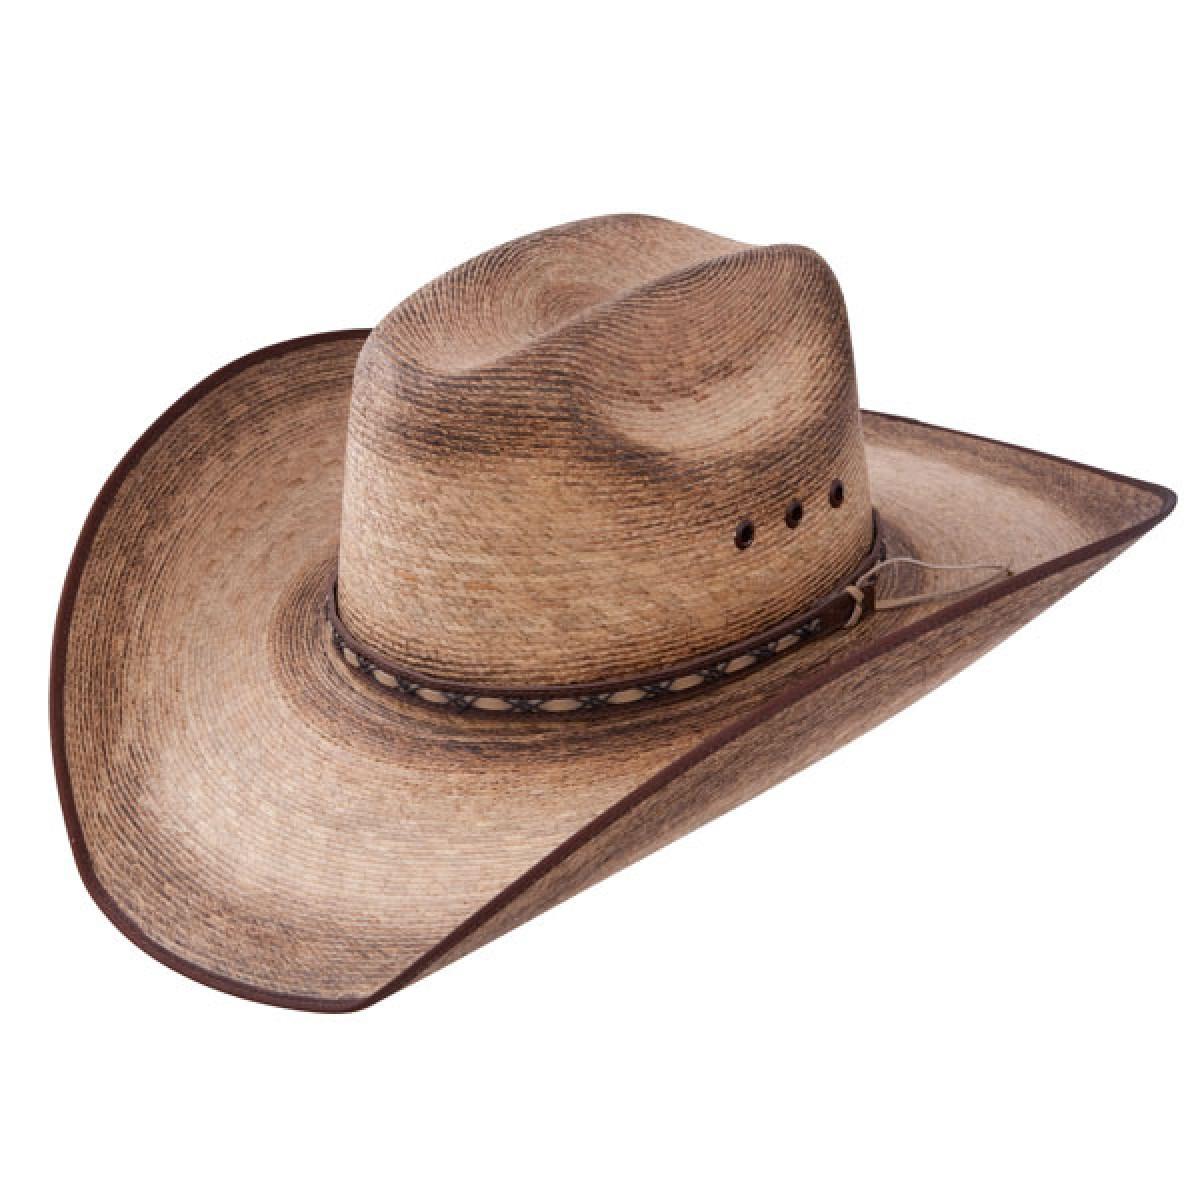 cowboy hats resistol jason aldean amarillo sky - mexican palm cowboy hat ... RZRVRDK